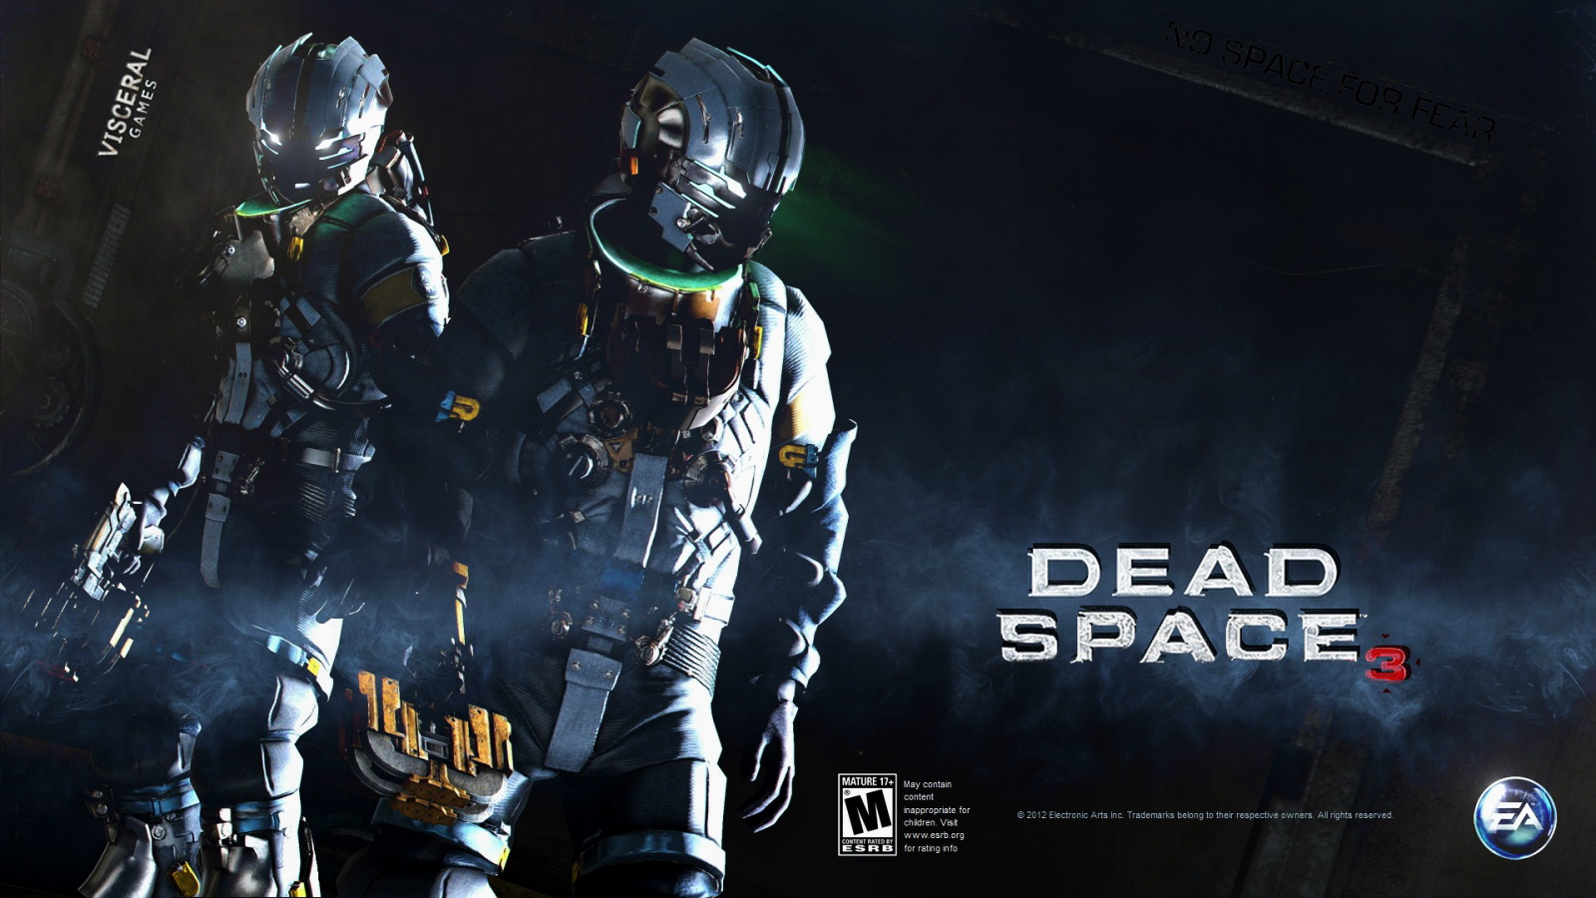 http://3.bp.blogspot.com/-0kgwgvFSZso/ULzcibtgJPI/AAAAAAAAGhM/vzj_56c01i4/s1600/Dead-Space-3-Game-EA-HD-Wallpaper_Vvallpaper.Net.jpg